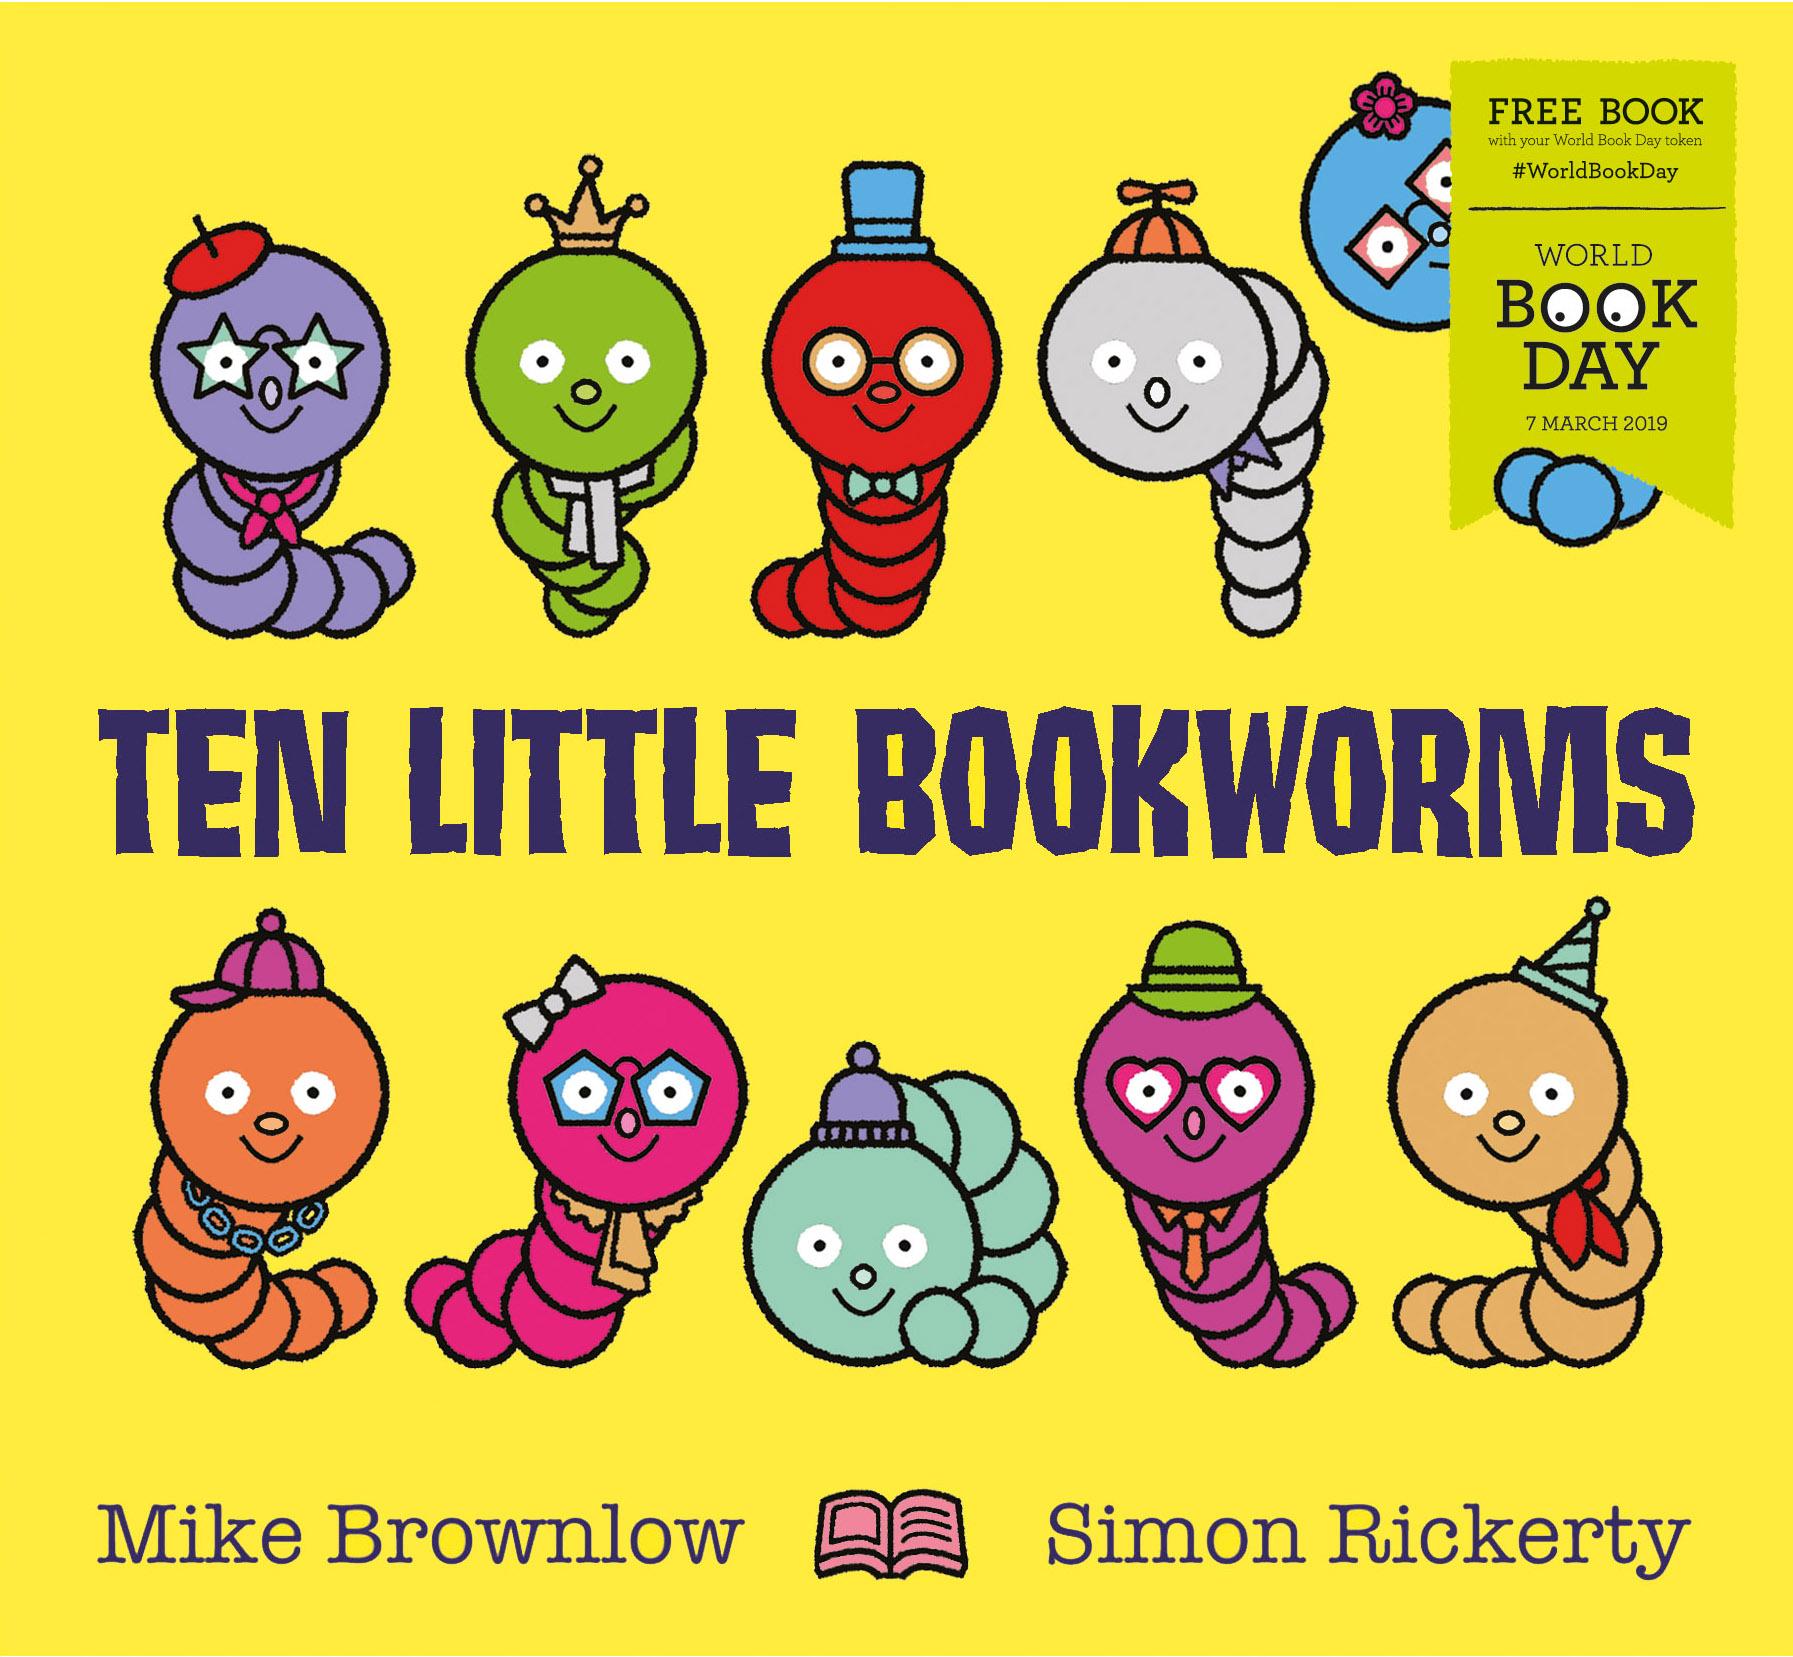 10 Little Bookworms- Jacket.jpg